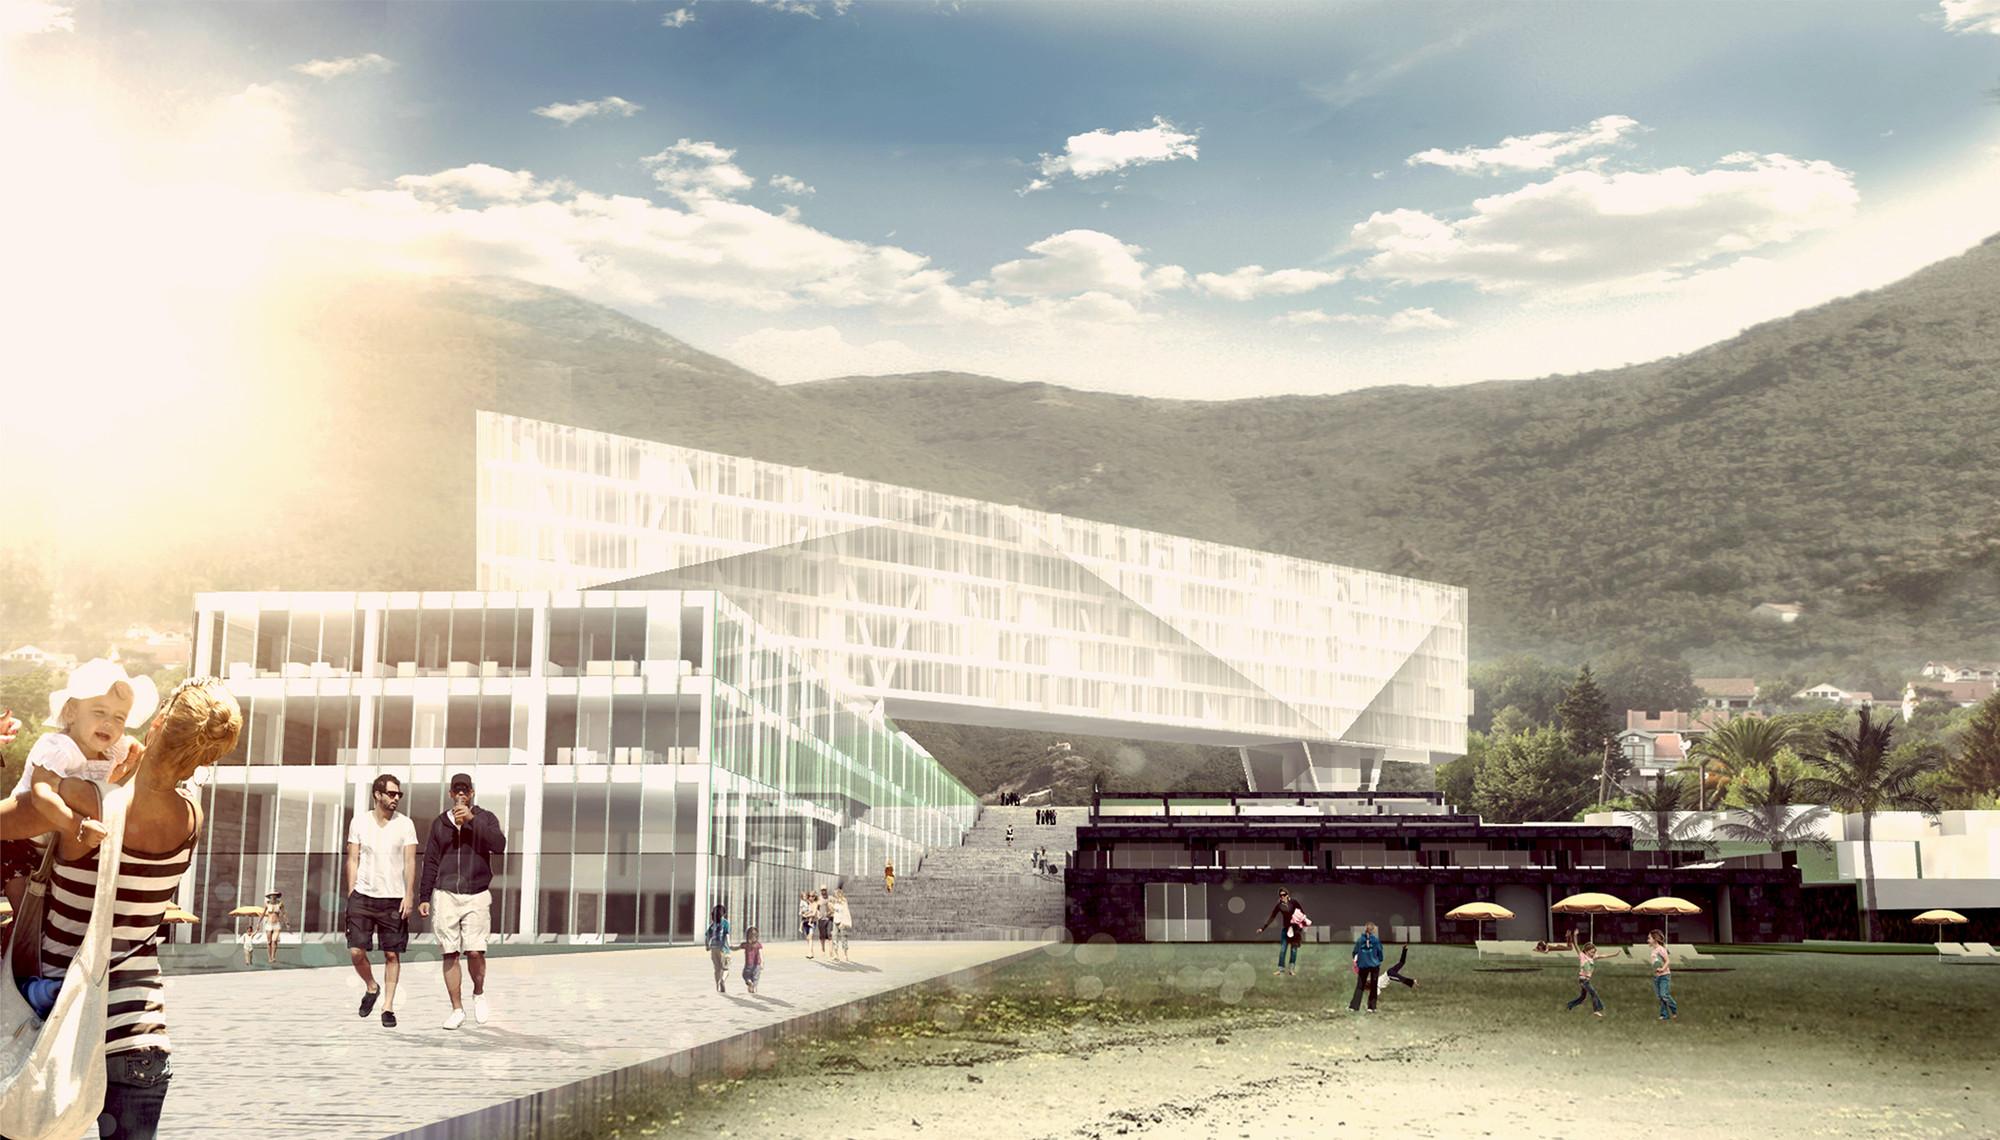 Hotel in Montenegro Competition Entry / Kana Arhitekti, Courtesy of Kana Arhitekti